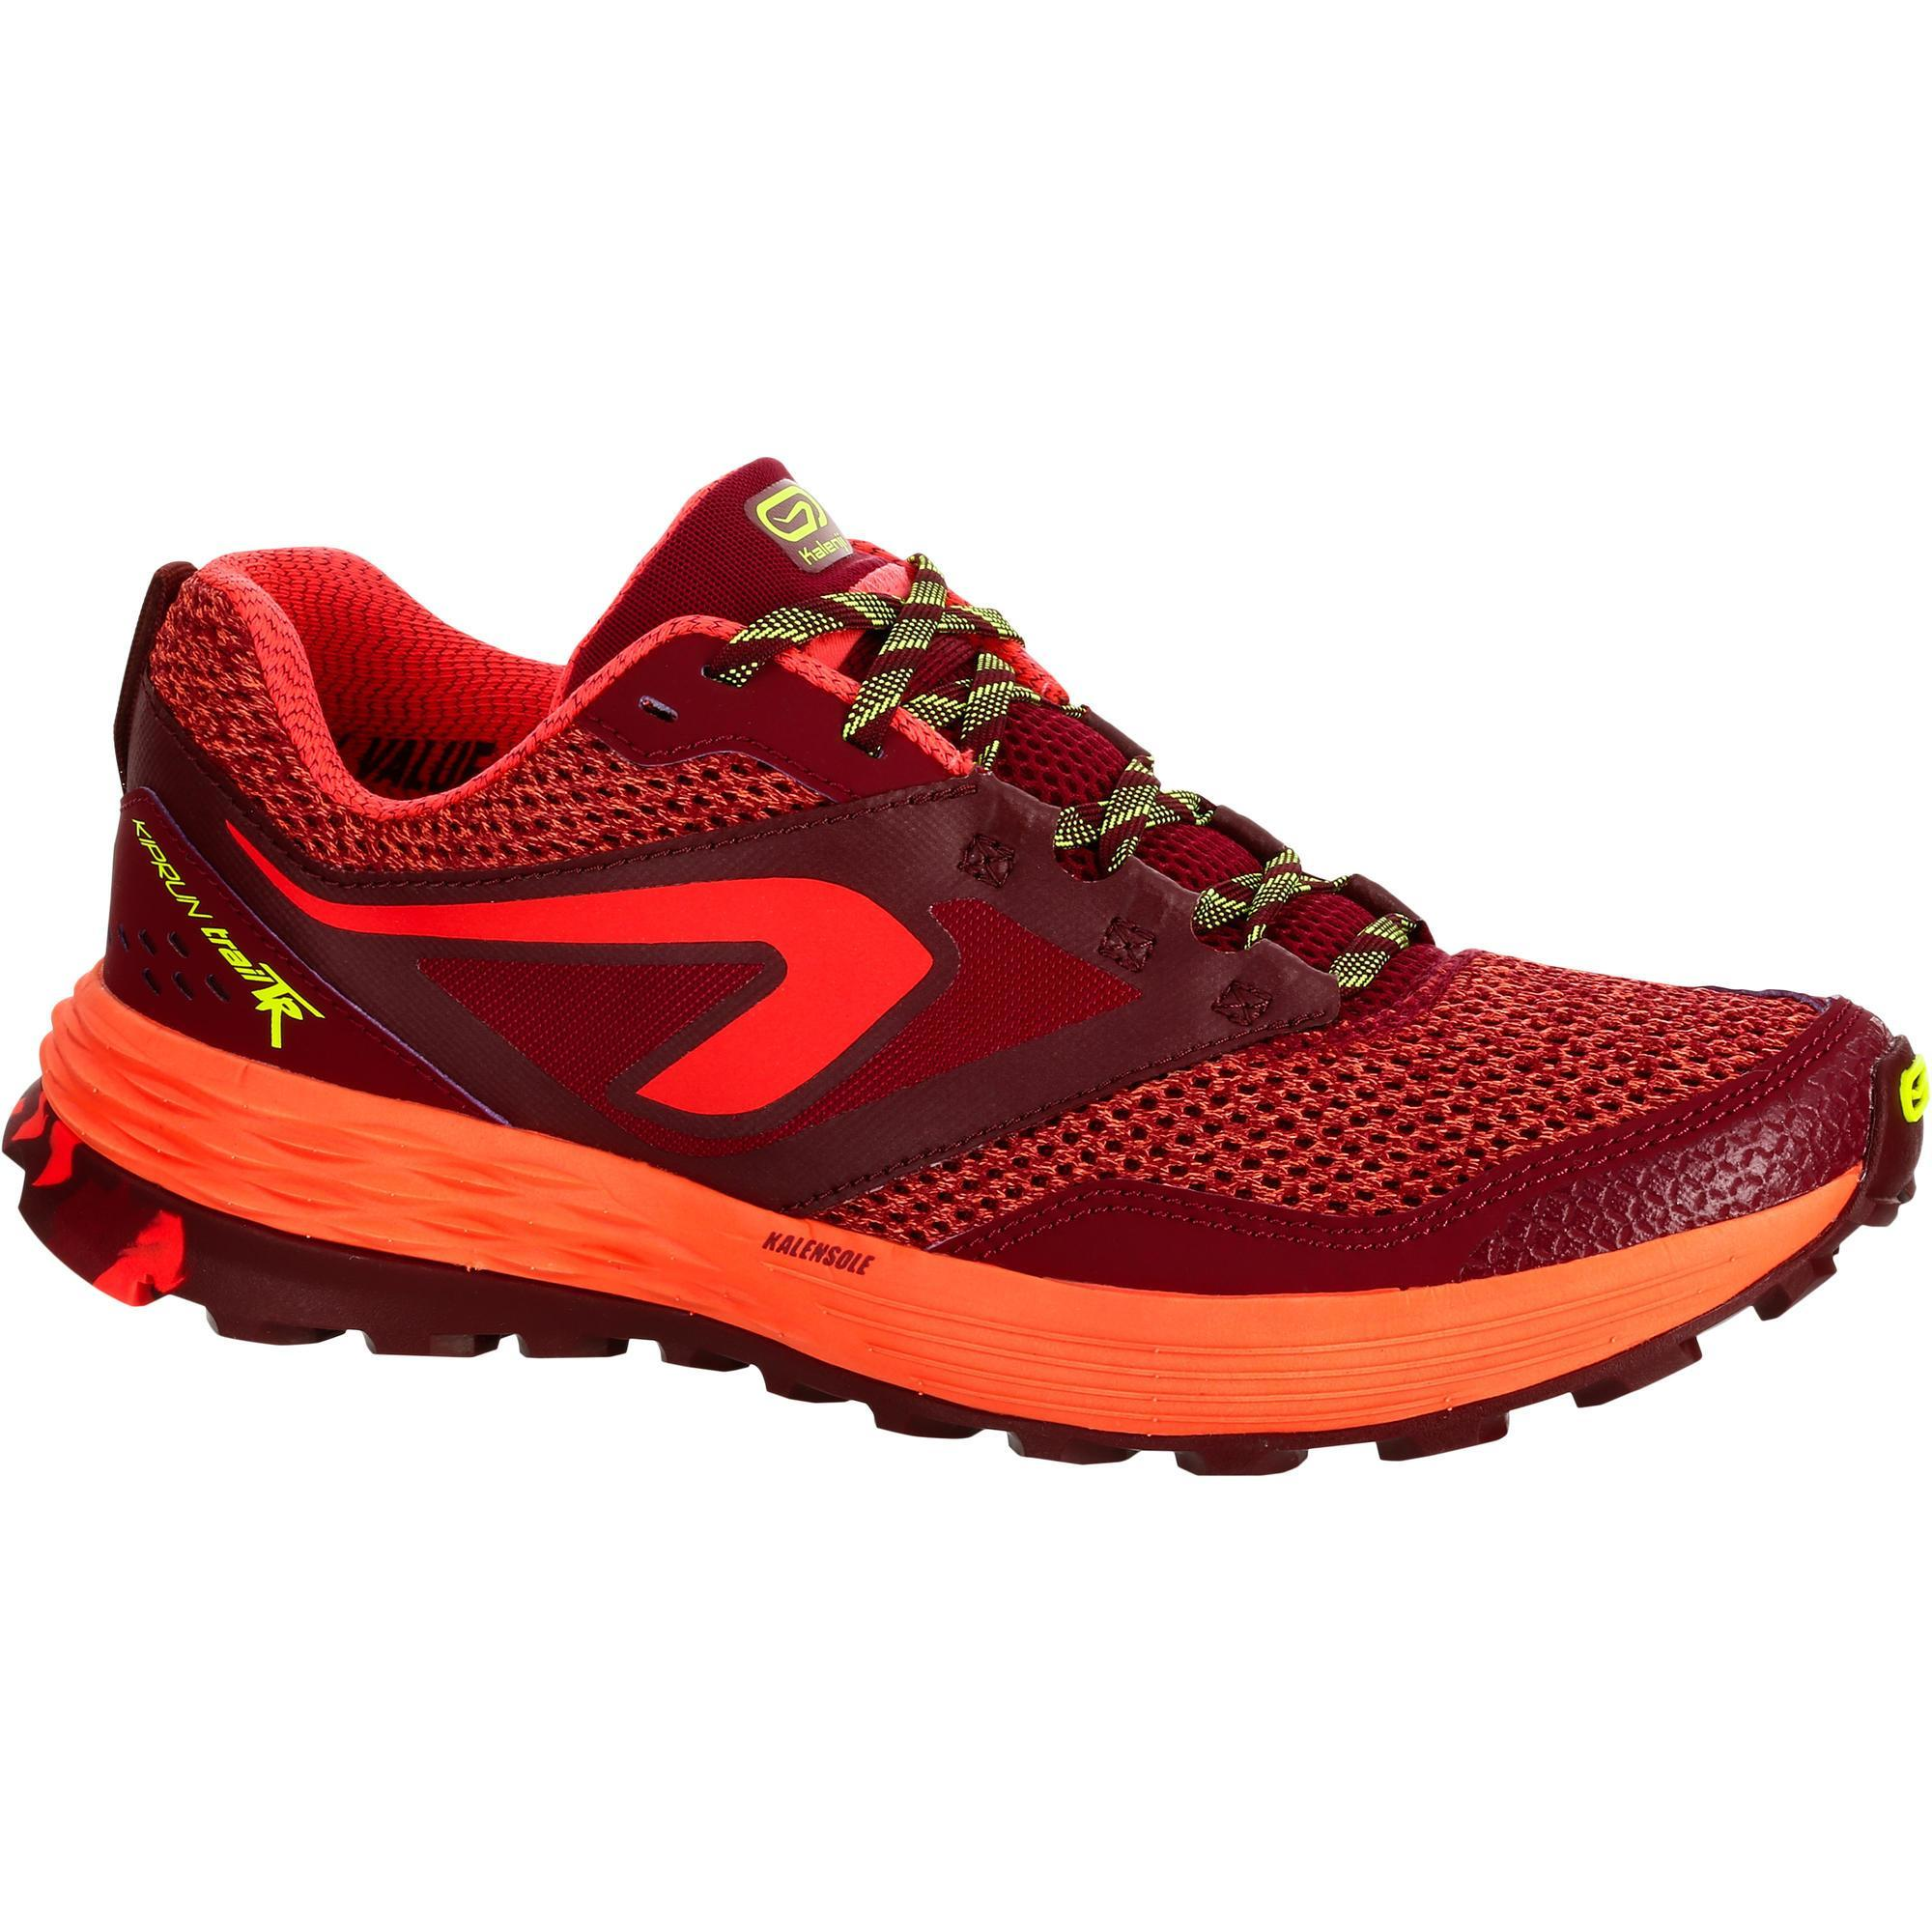 2501090 Kalenji Trailschoenen dames Kiprun Trail TR roze bordeaux